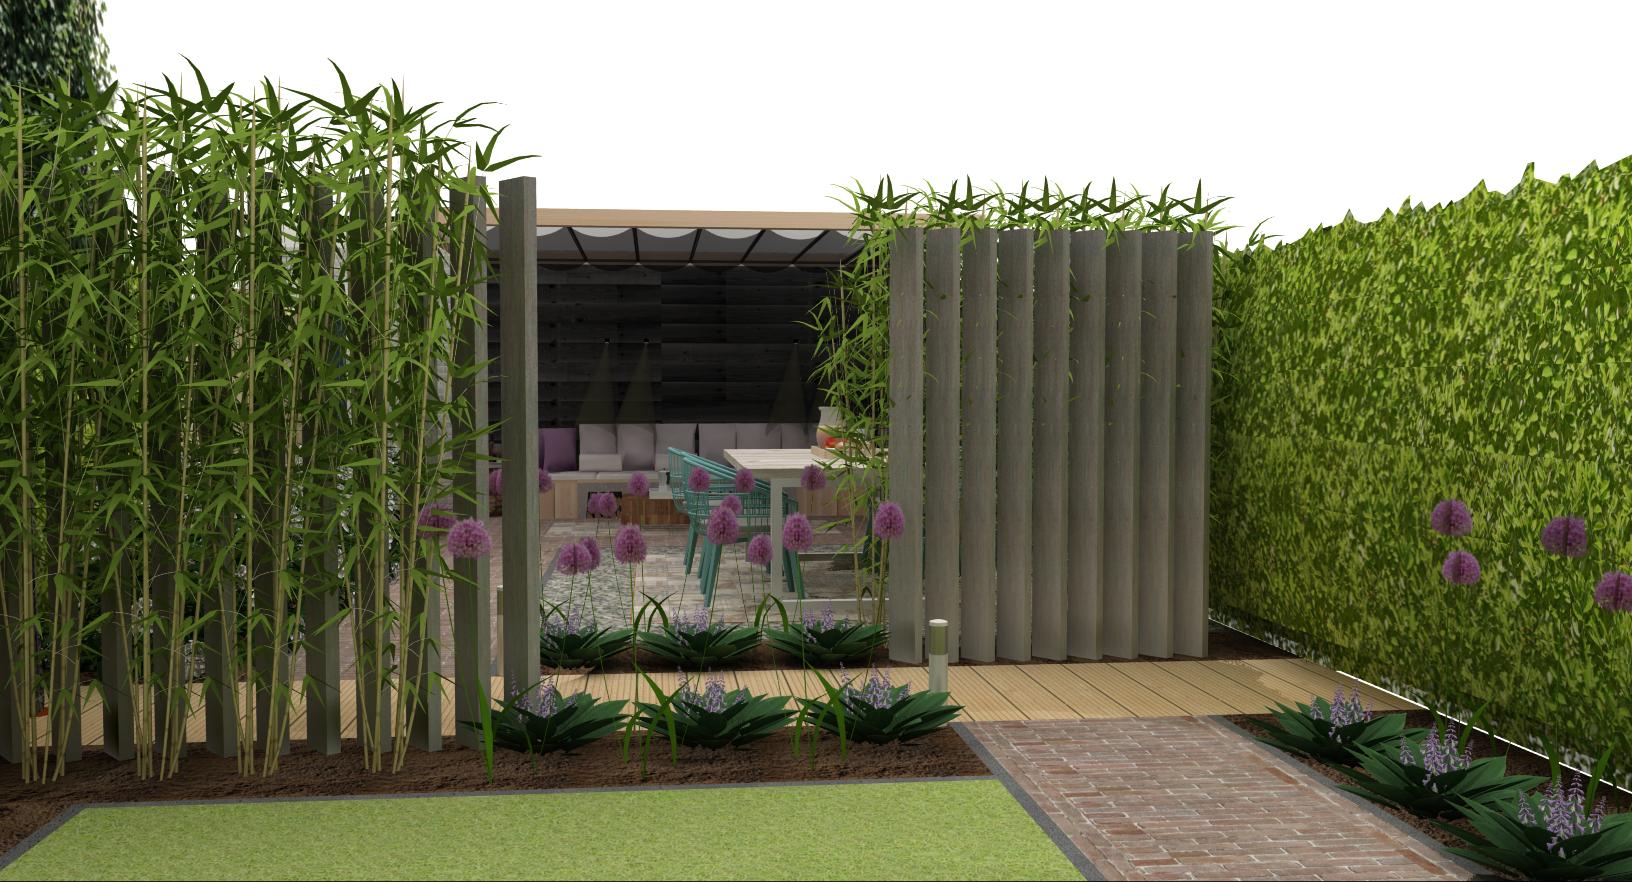 Tuinontwerp achtertuin - Modern Japanse stijl achter